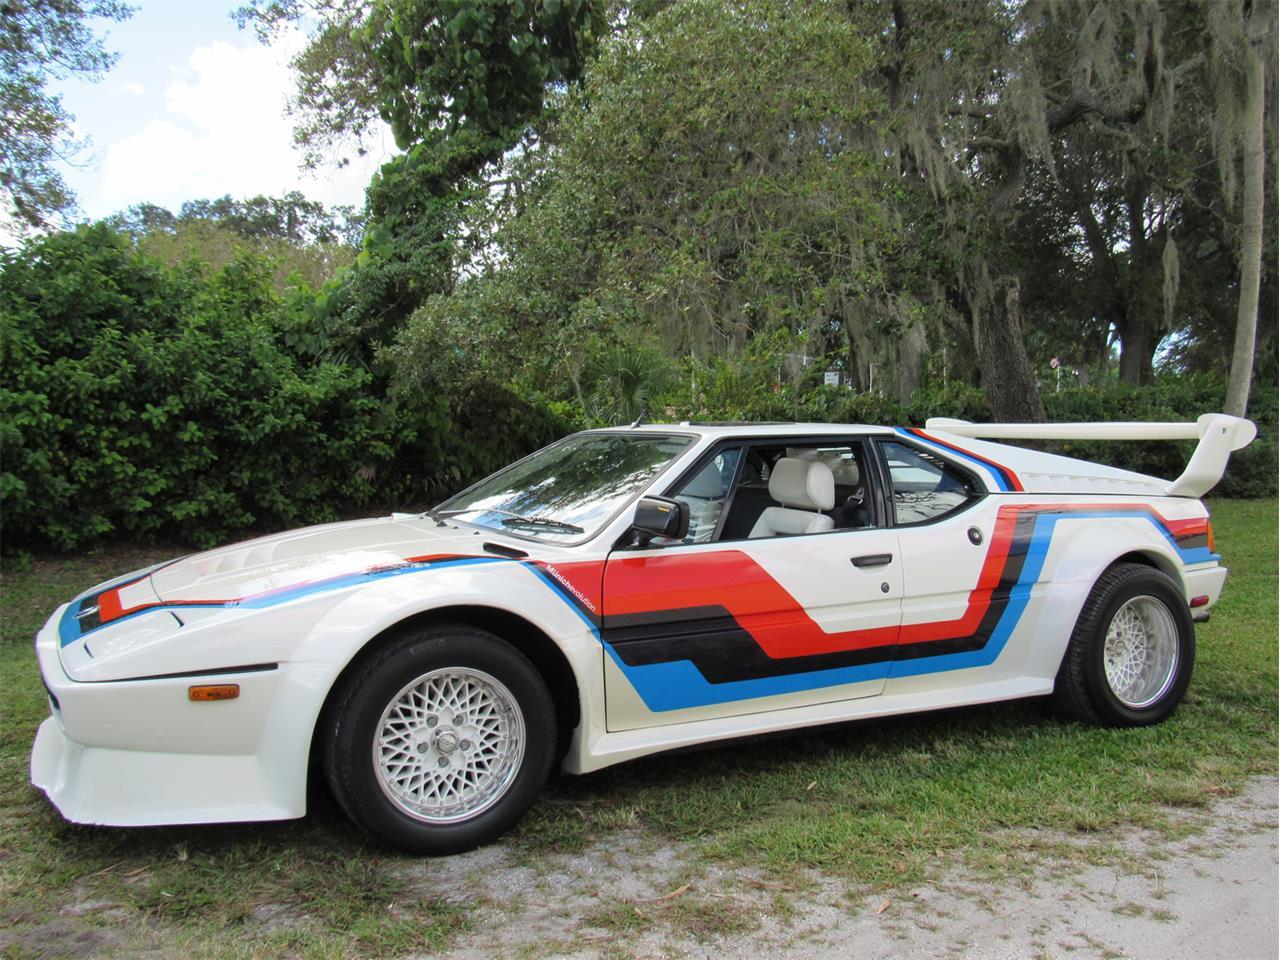 BMW M1 For Sale >> 1979 Bmw M1 For Sale Classiccars Com Cc 912586